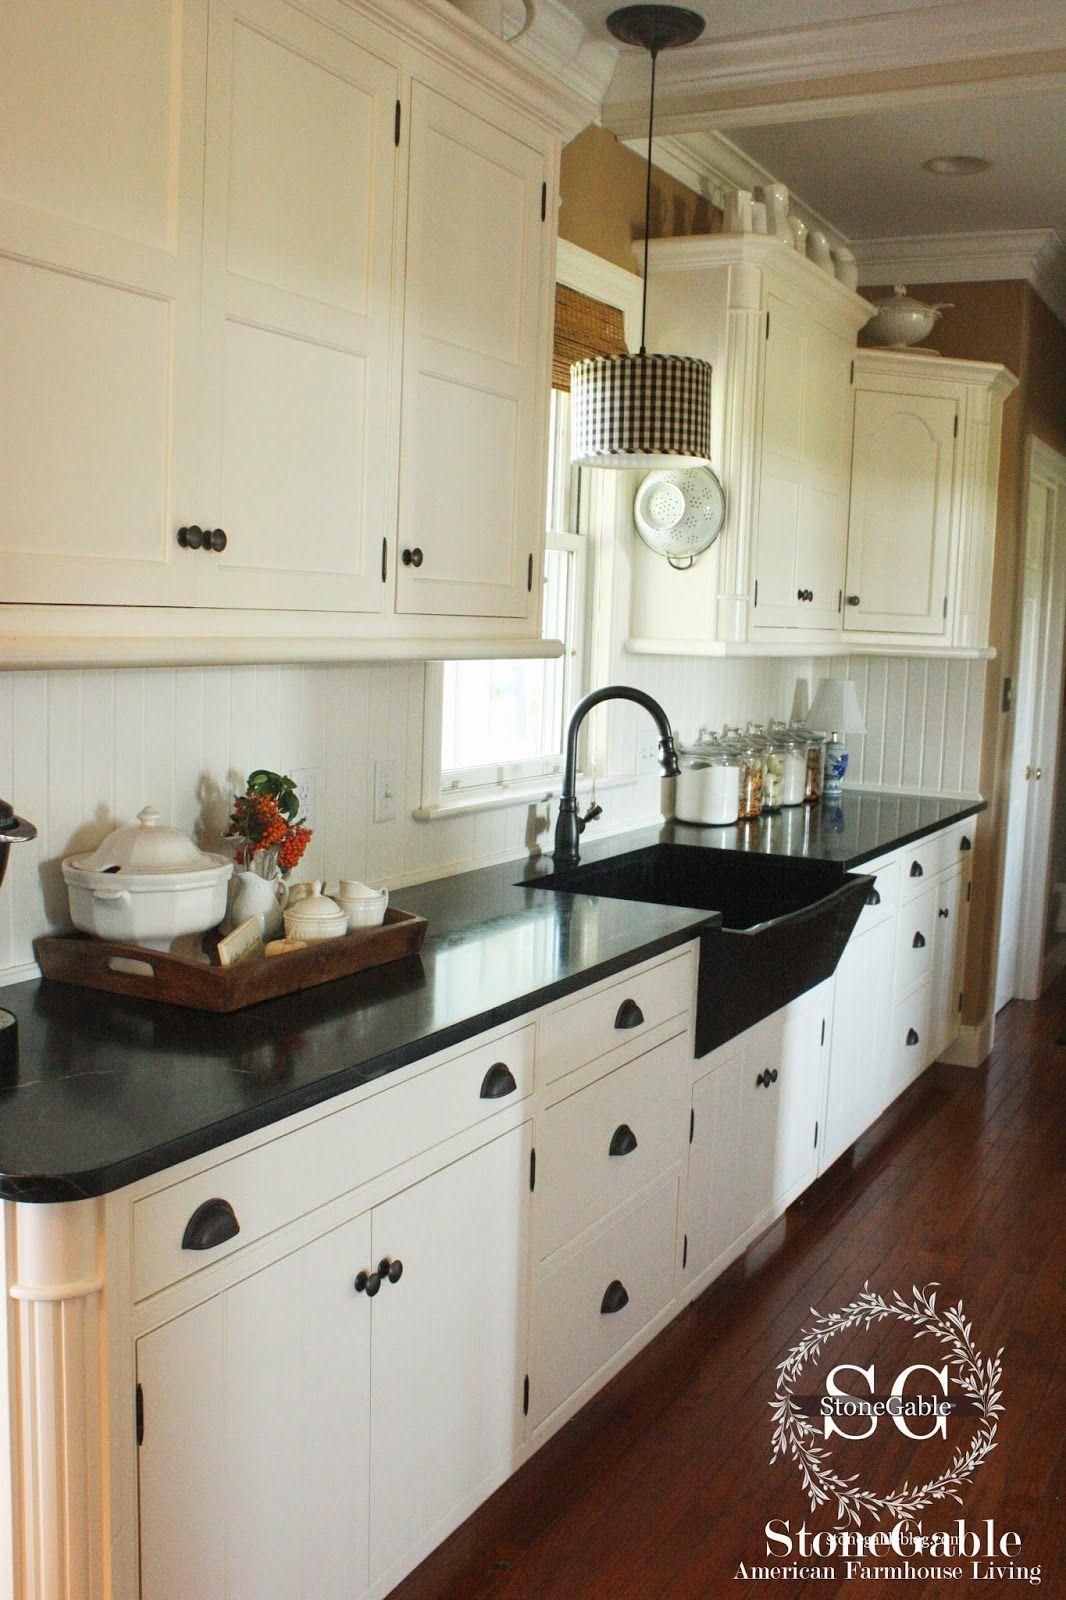 10 elements of a farmhouse kitchen kitchen cabinets decor kitchen remodel farmhouse style on farmhouse kitchen decor countertop id=54600